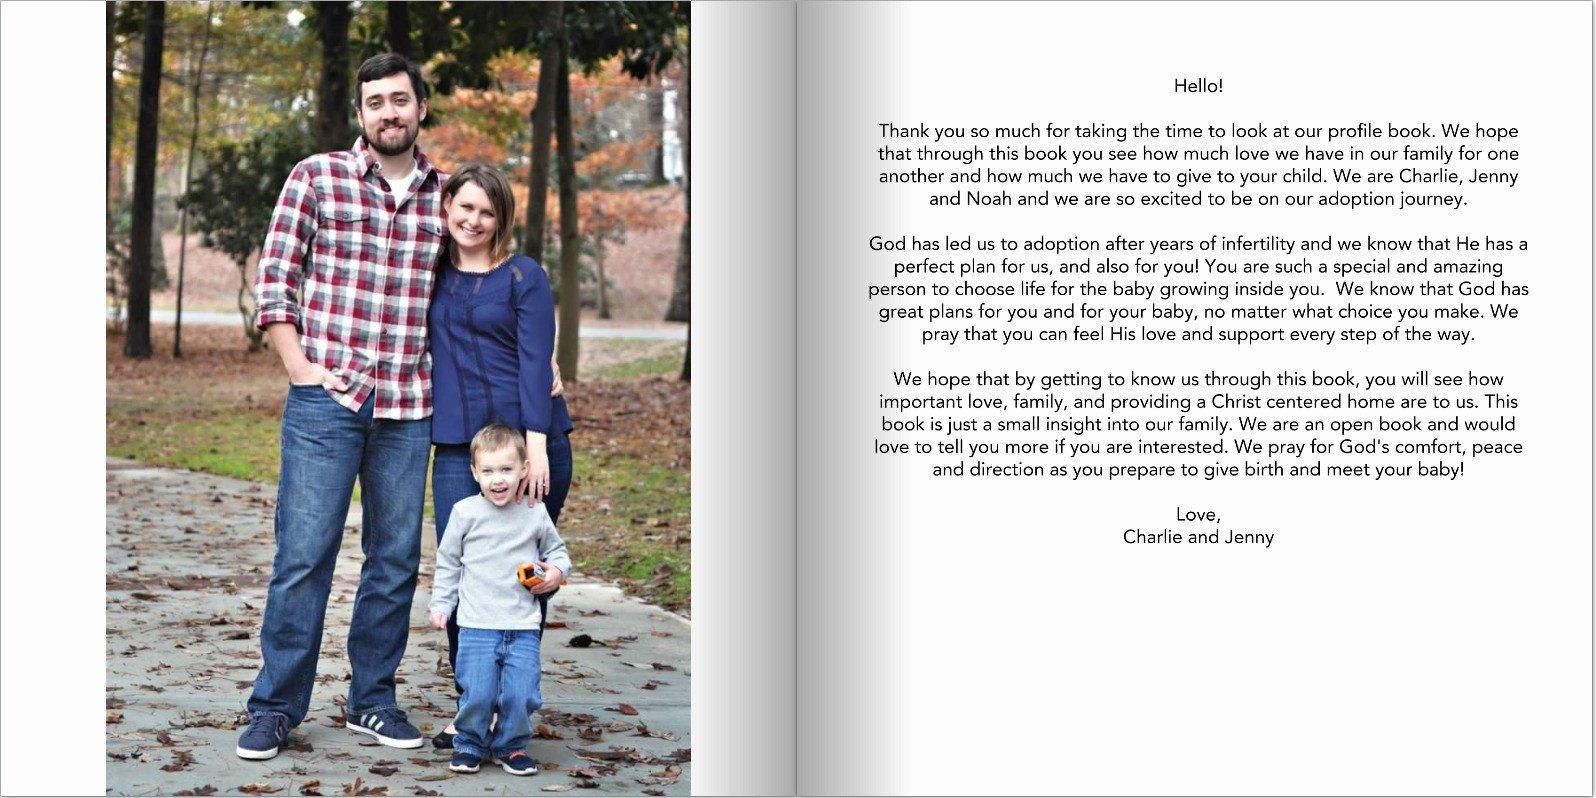 Adoption Profile Book Template Cloth Diaper Revival Our Adoption Profile Book